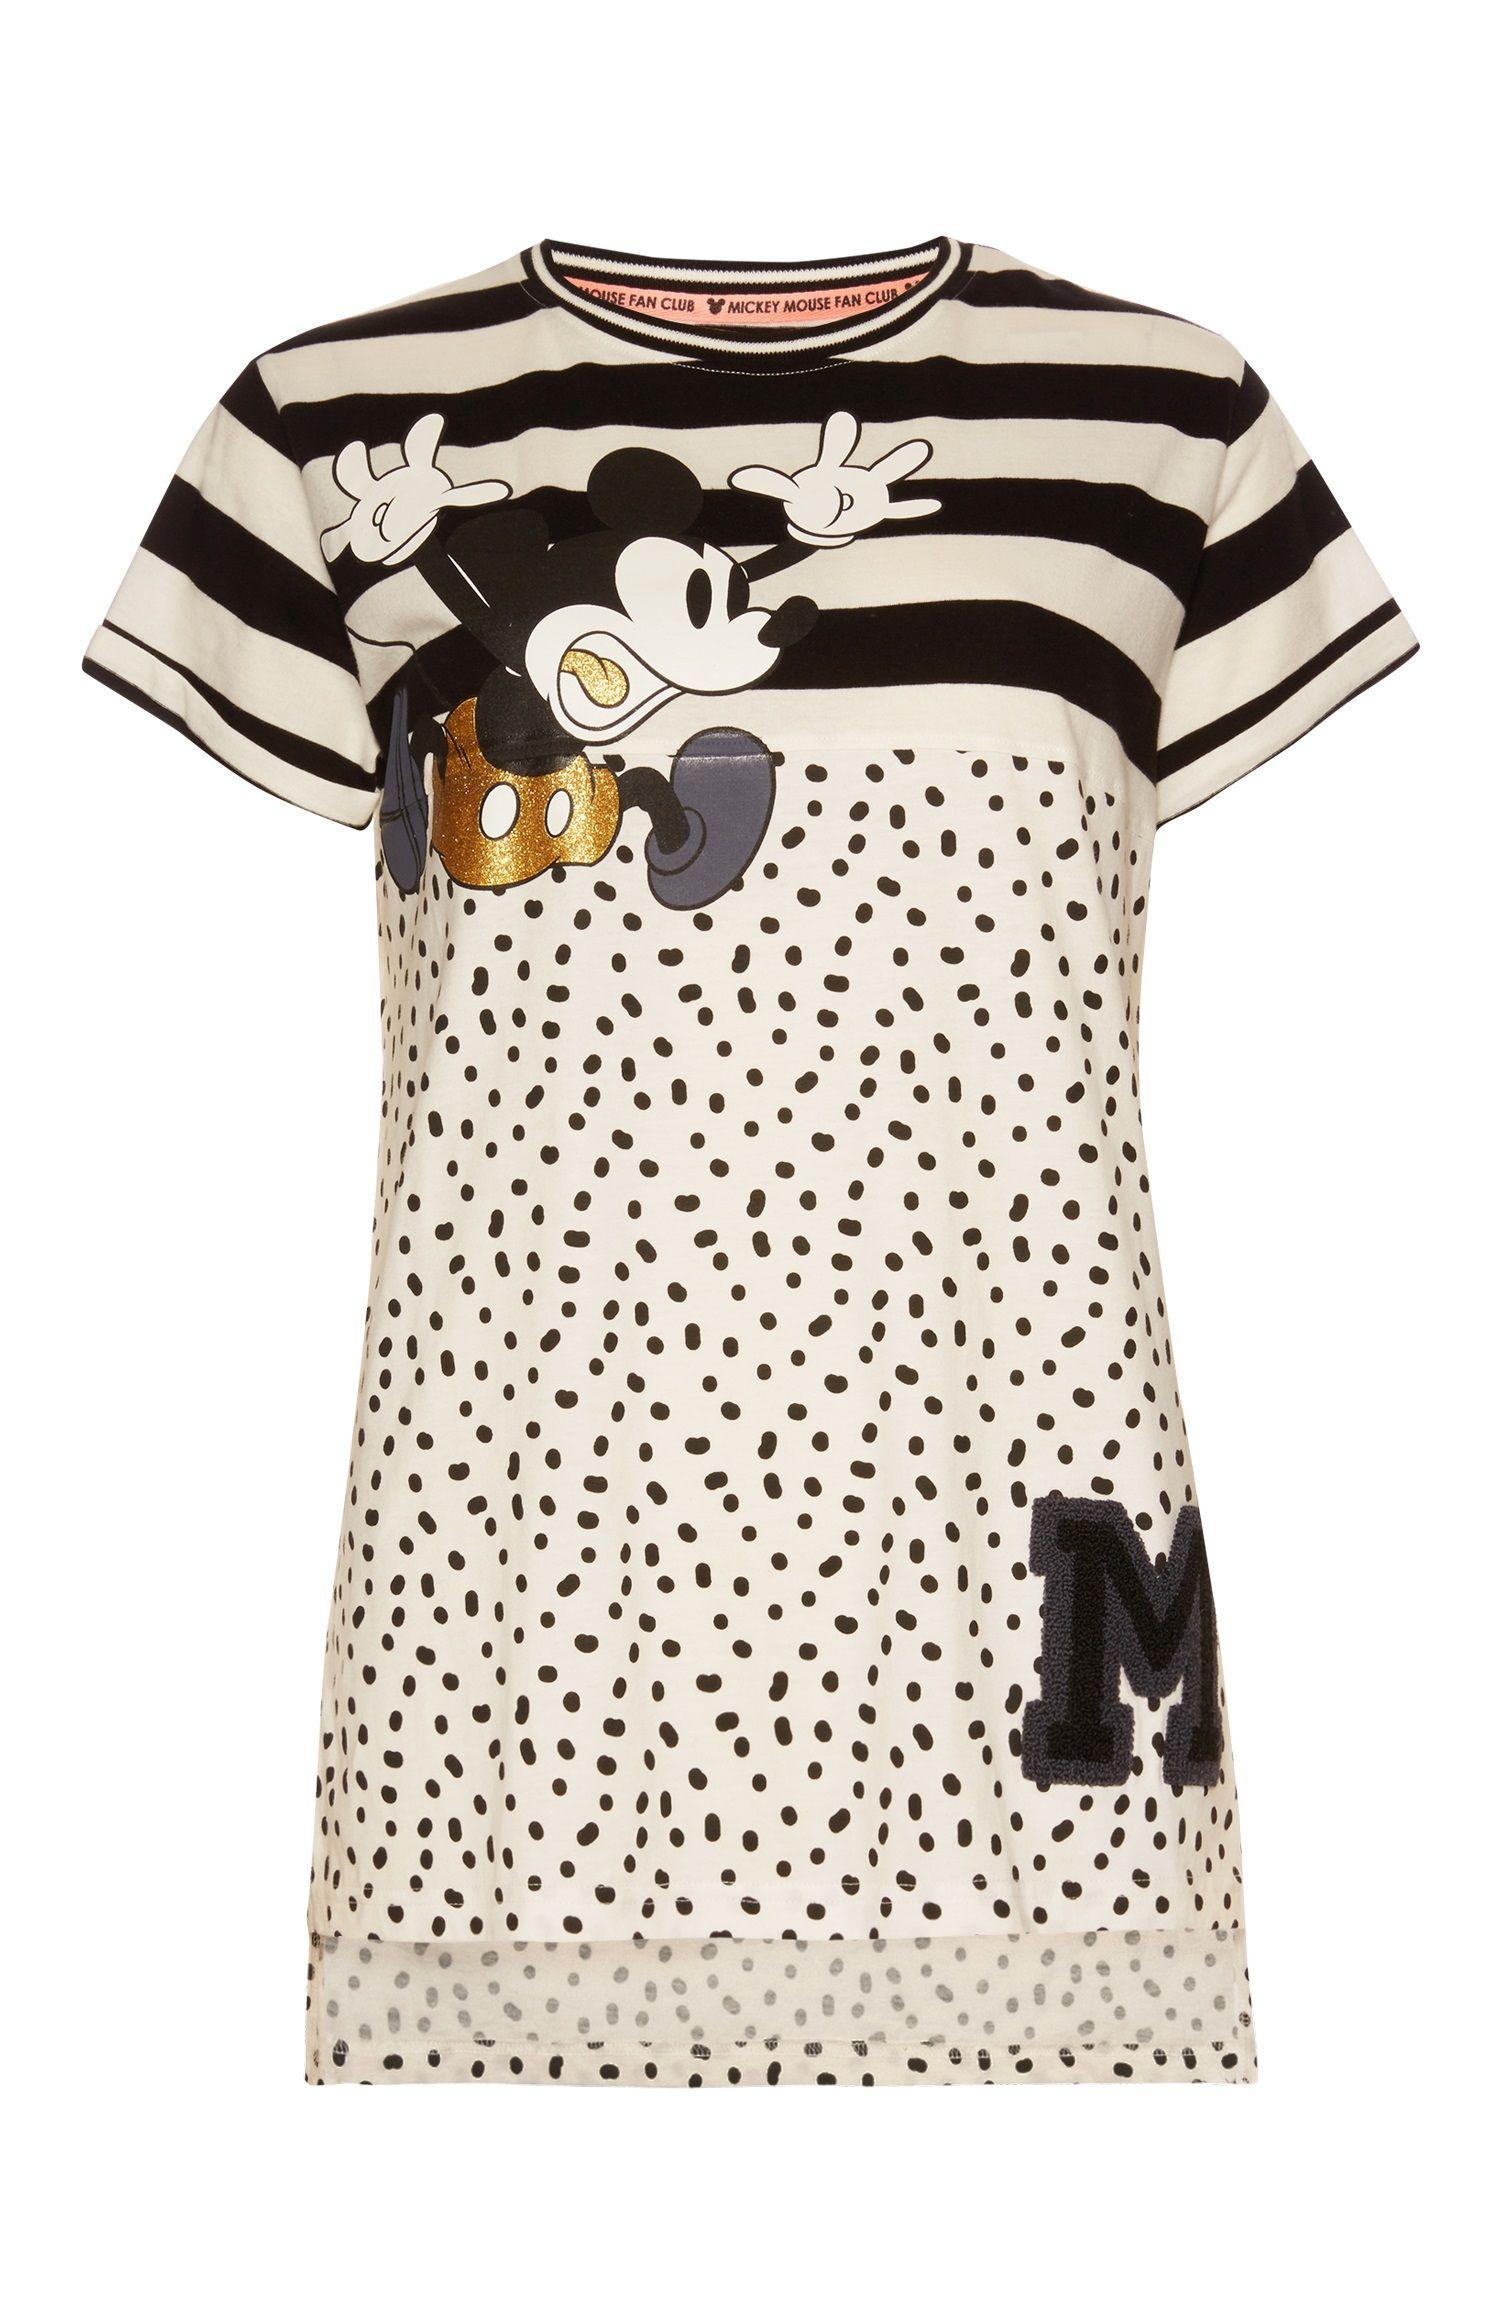 e7a736a238327 Primark - Mickey Mouse Varsity PJ Top